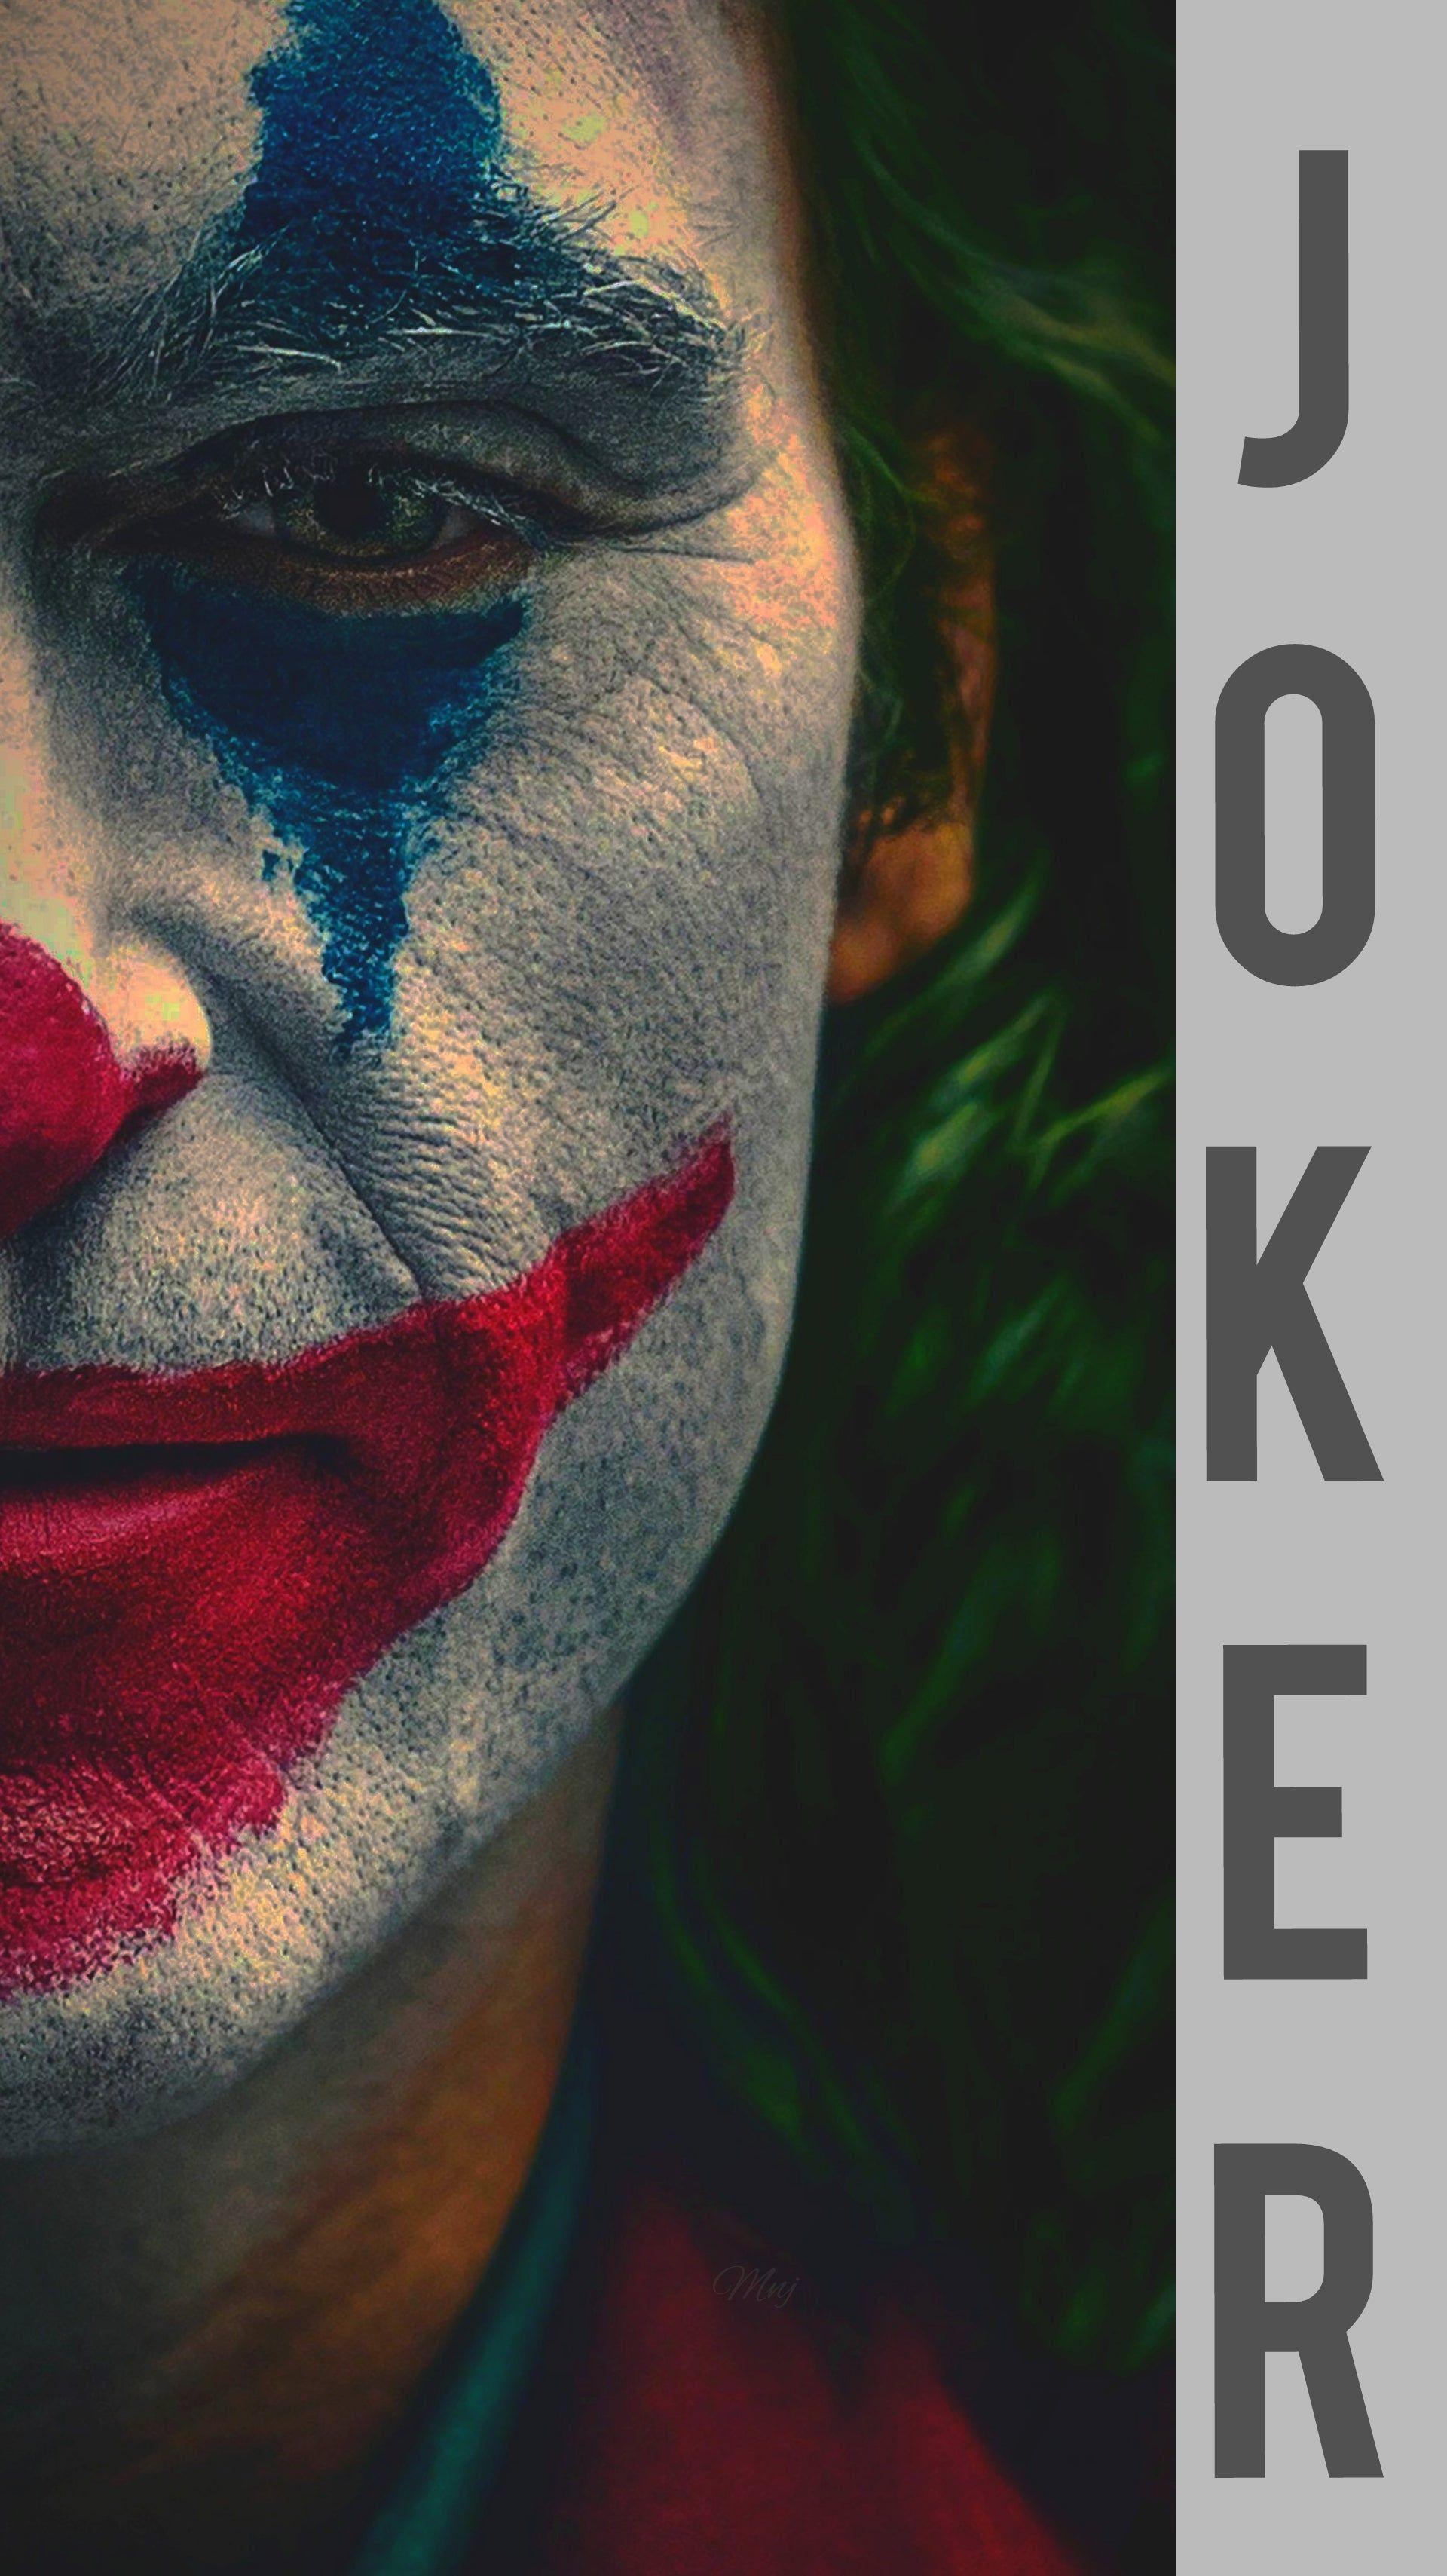 Joker 2019 Smart Phone Wallpapers Joker Joker Hd Wallpaper Joker Wallpapers